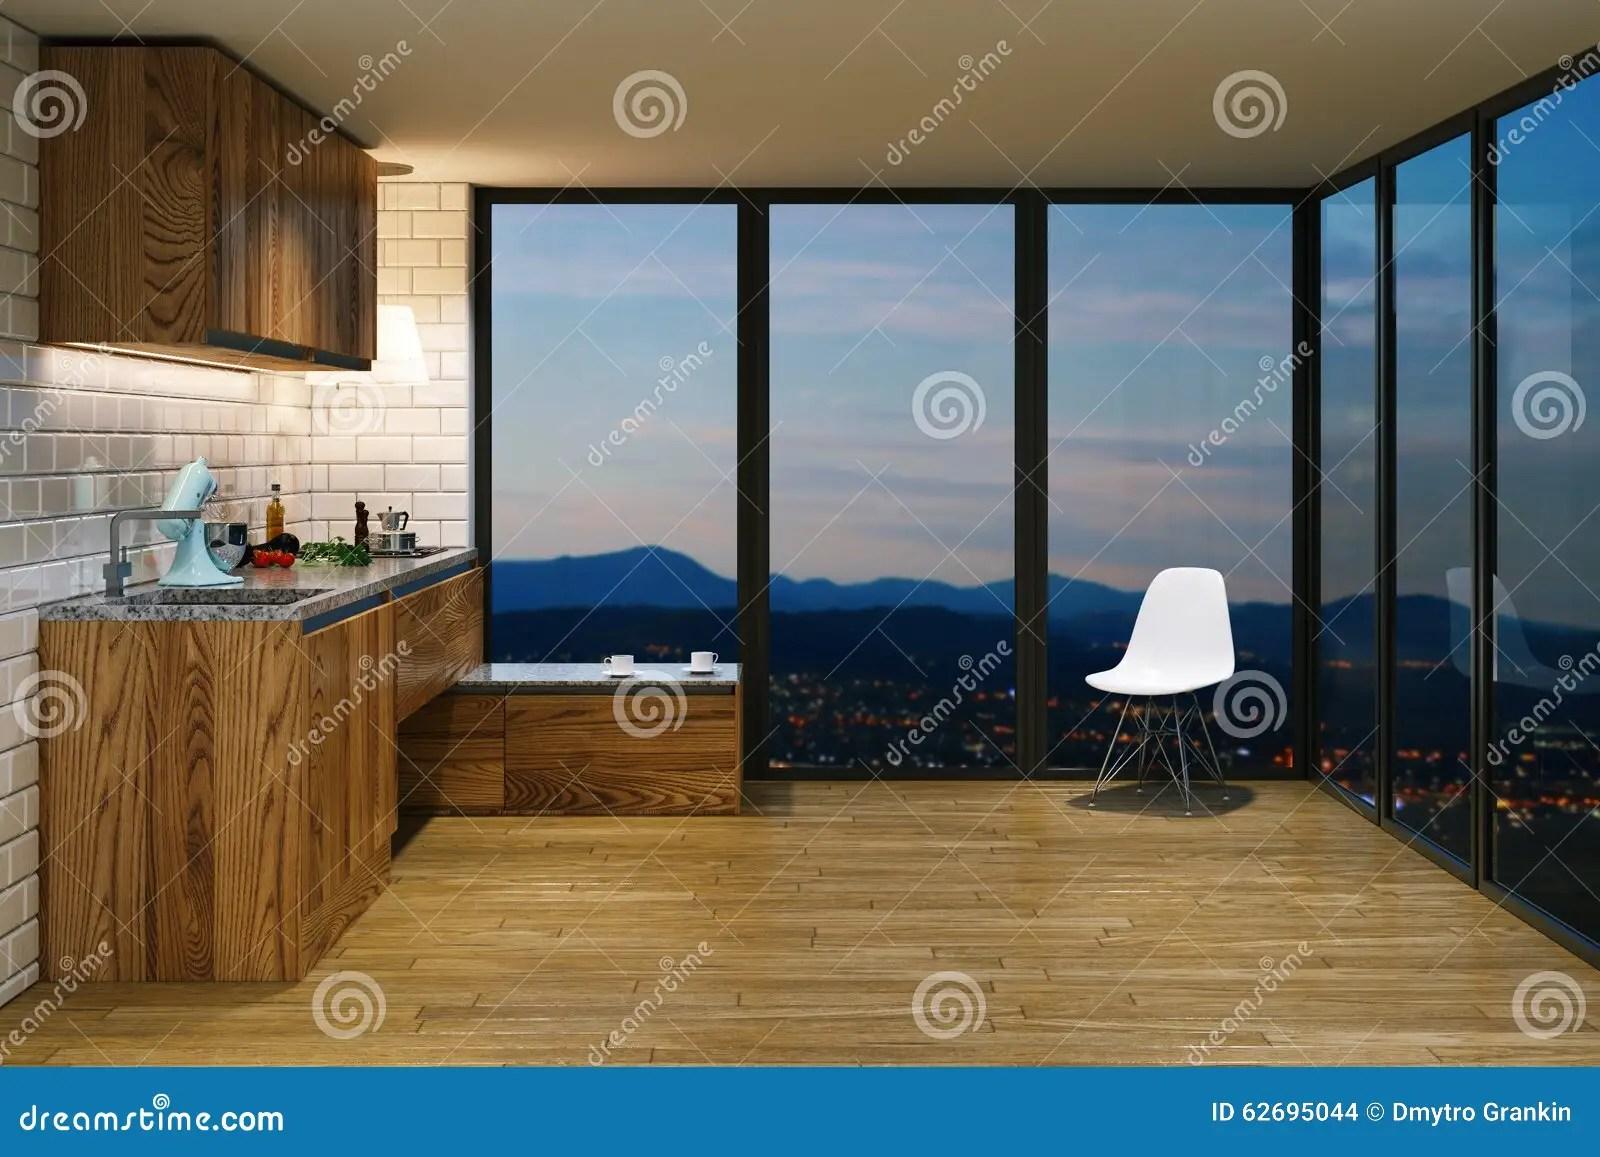 kitchen aid colors soap dispenser for 在现代内部的木厨房家具从b的晚上视图库存例证 插画包括有里面 庄园 在现代内部的木厨房家具从b的晚上视图